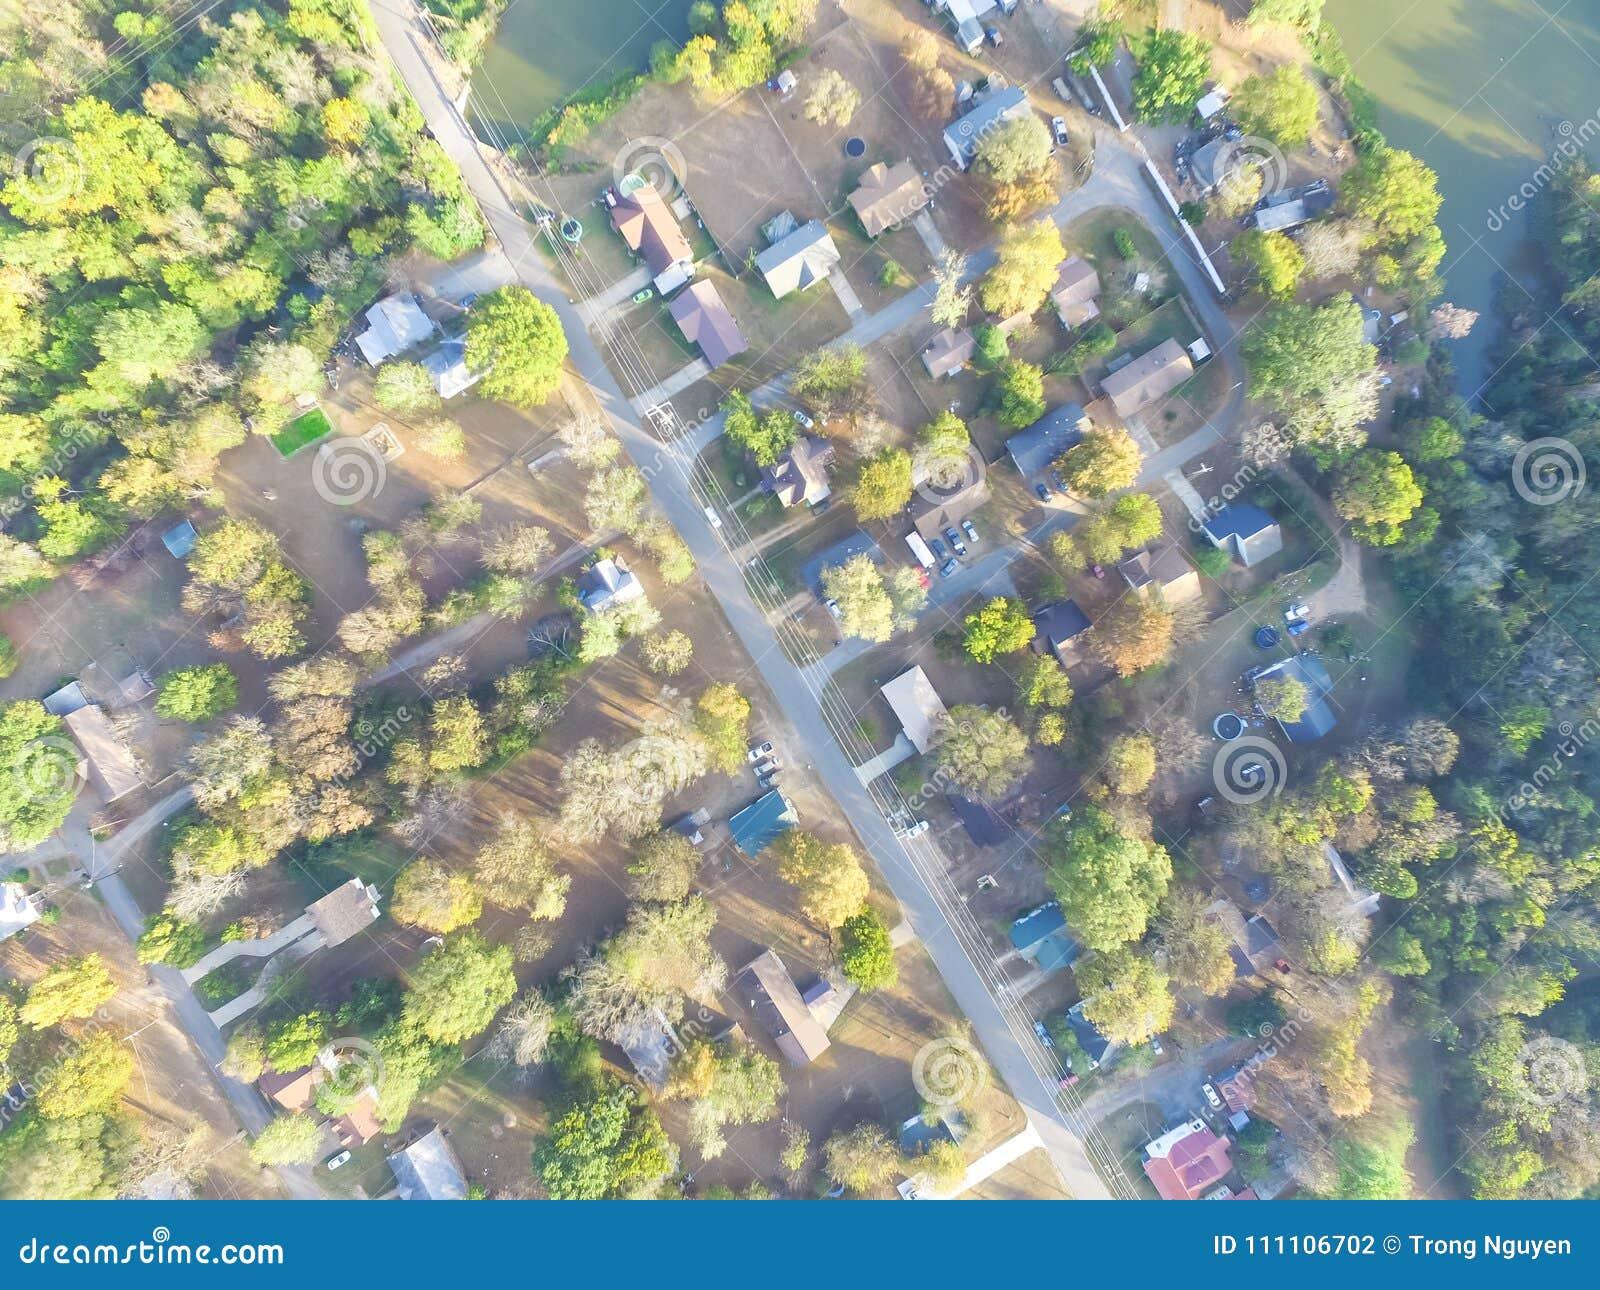 Vista aérea escénica del área suburbana verde de Ozark, Arkansas, los E.E.U.U.